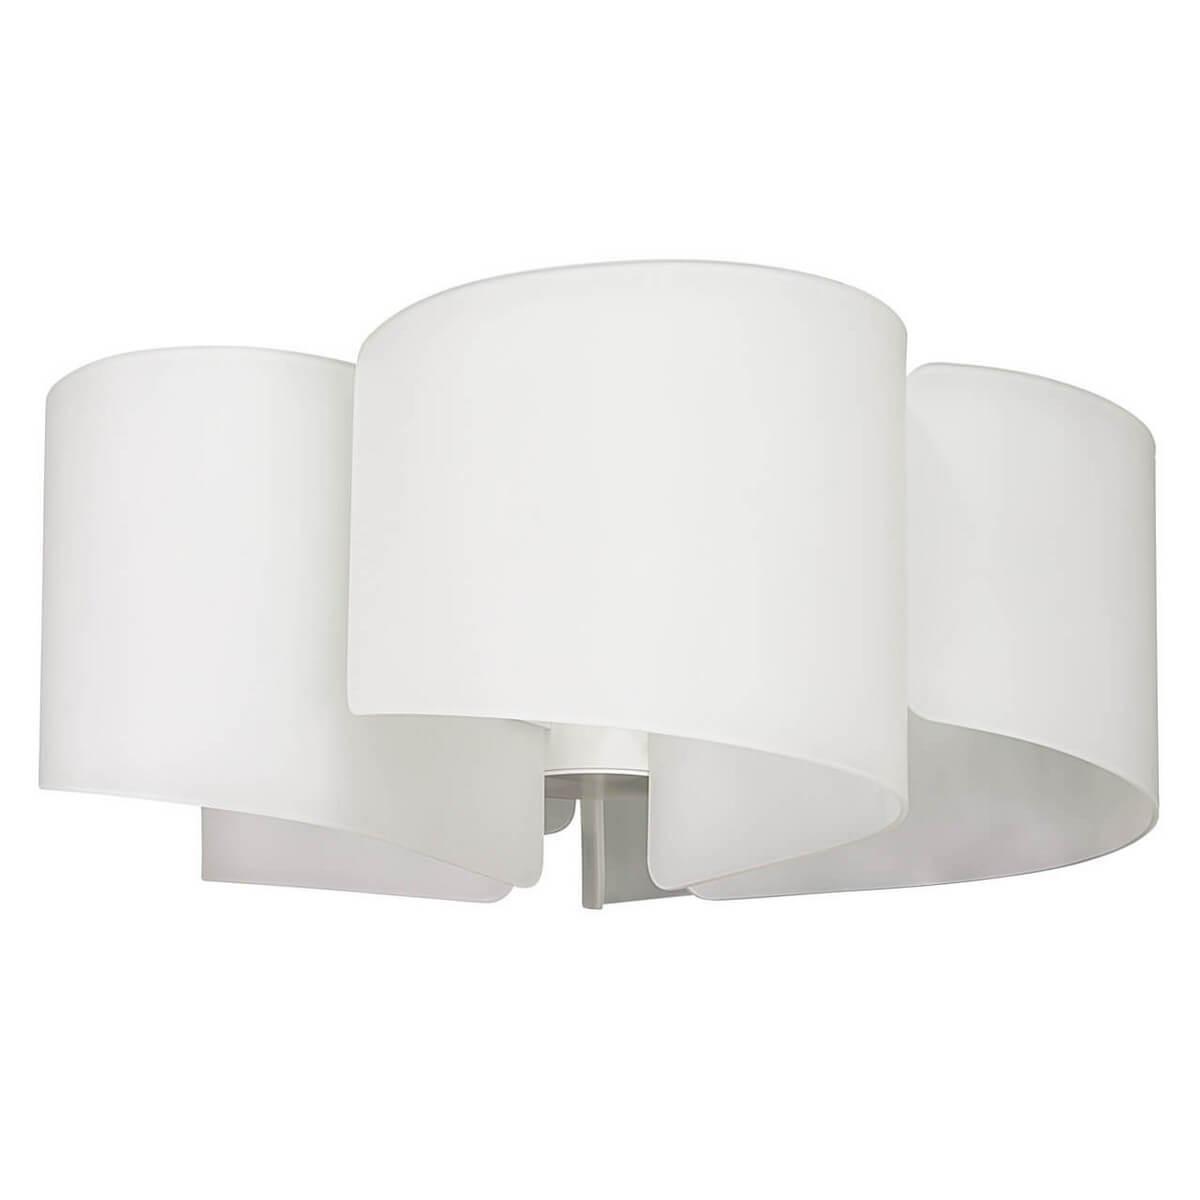 Потолочный светильник Lightstar 811050, E27, 40 Вт lightstar 214316